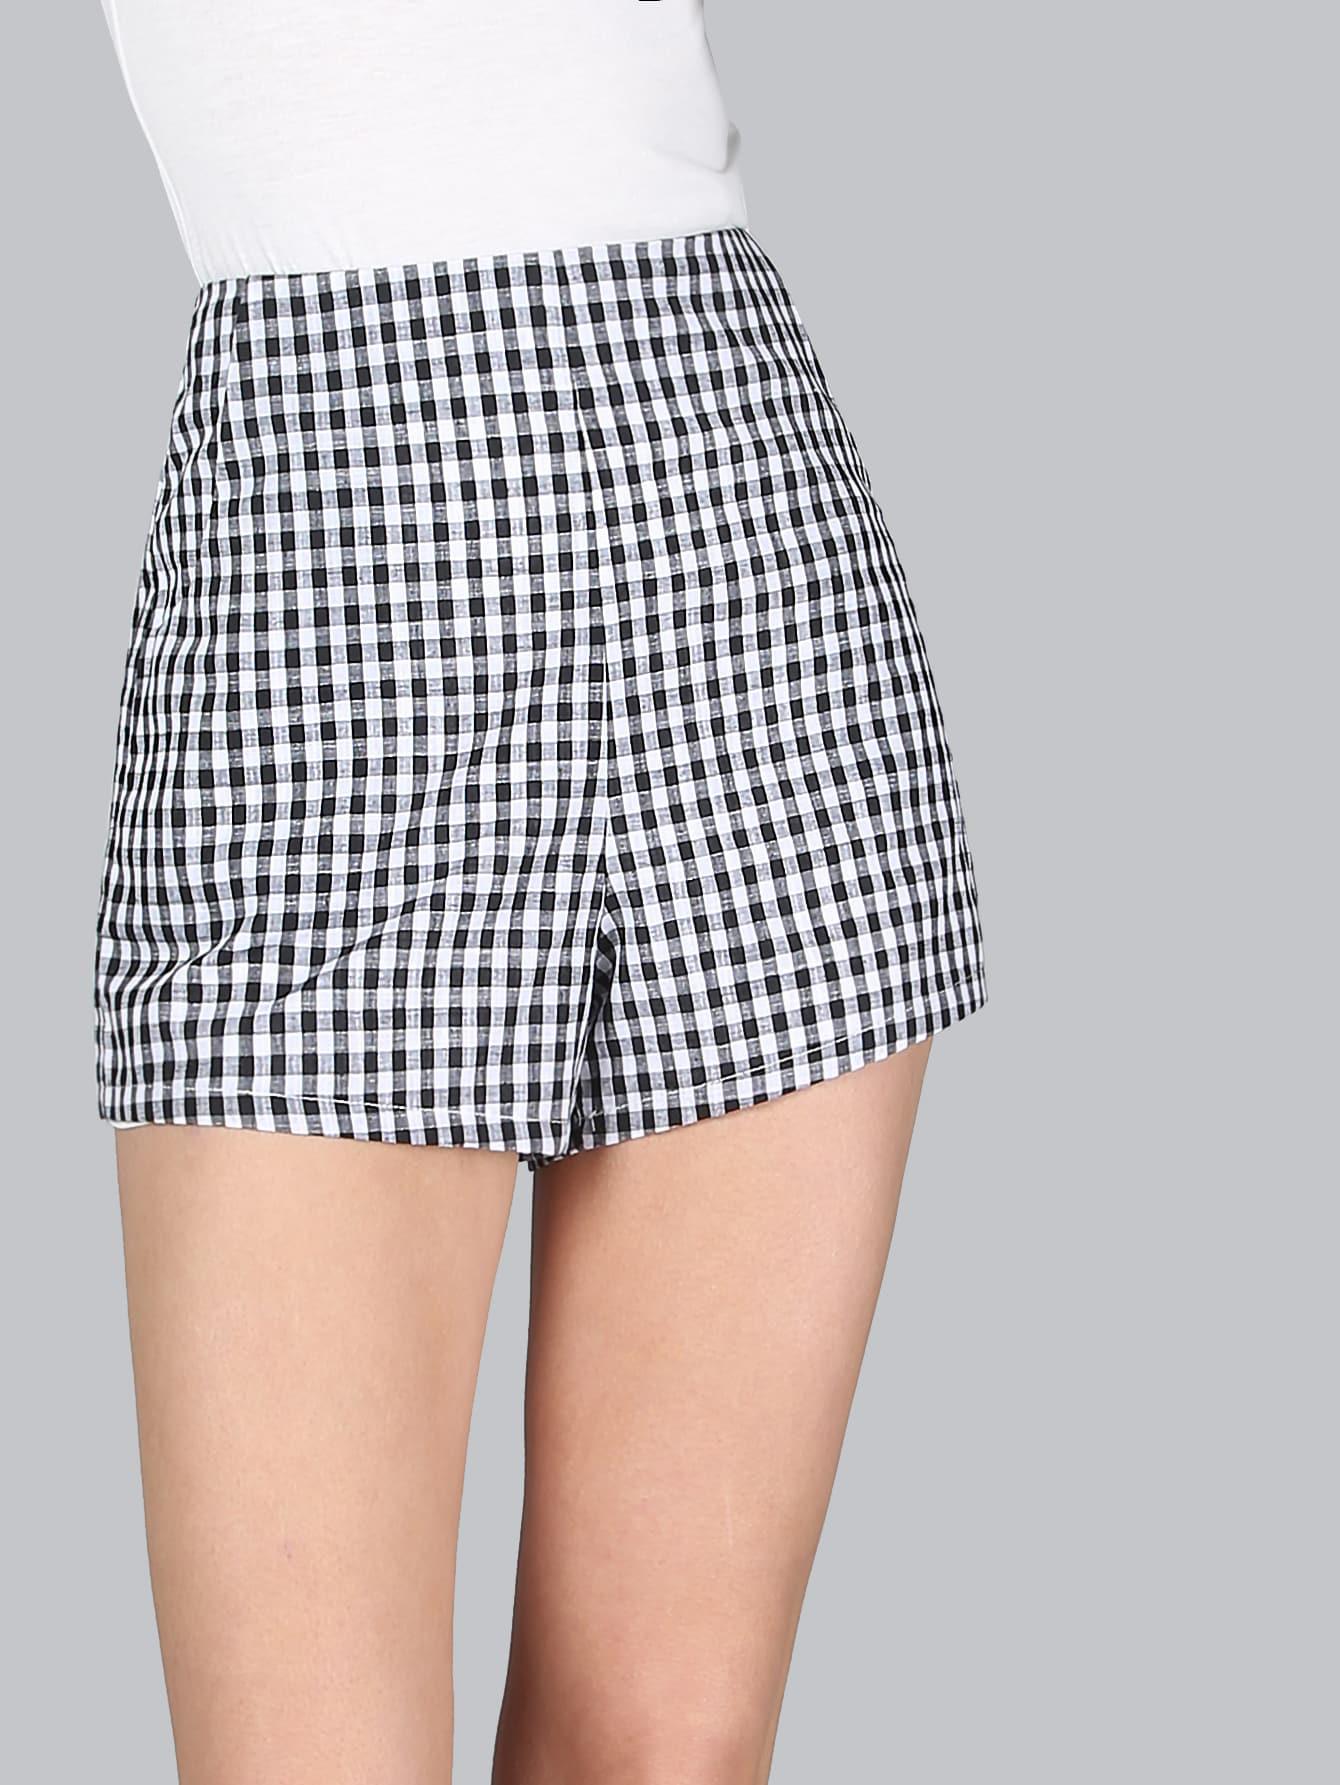 Checkered High Waist Shorts BLACK -SheIn(Sheinside)